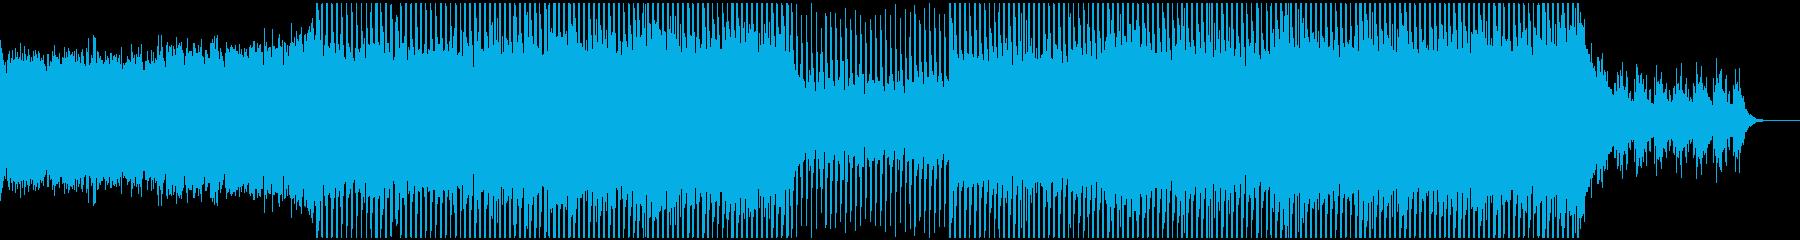 EDMメカニカル、テクノ、クラブ系-02の再生済みの波形